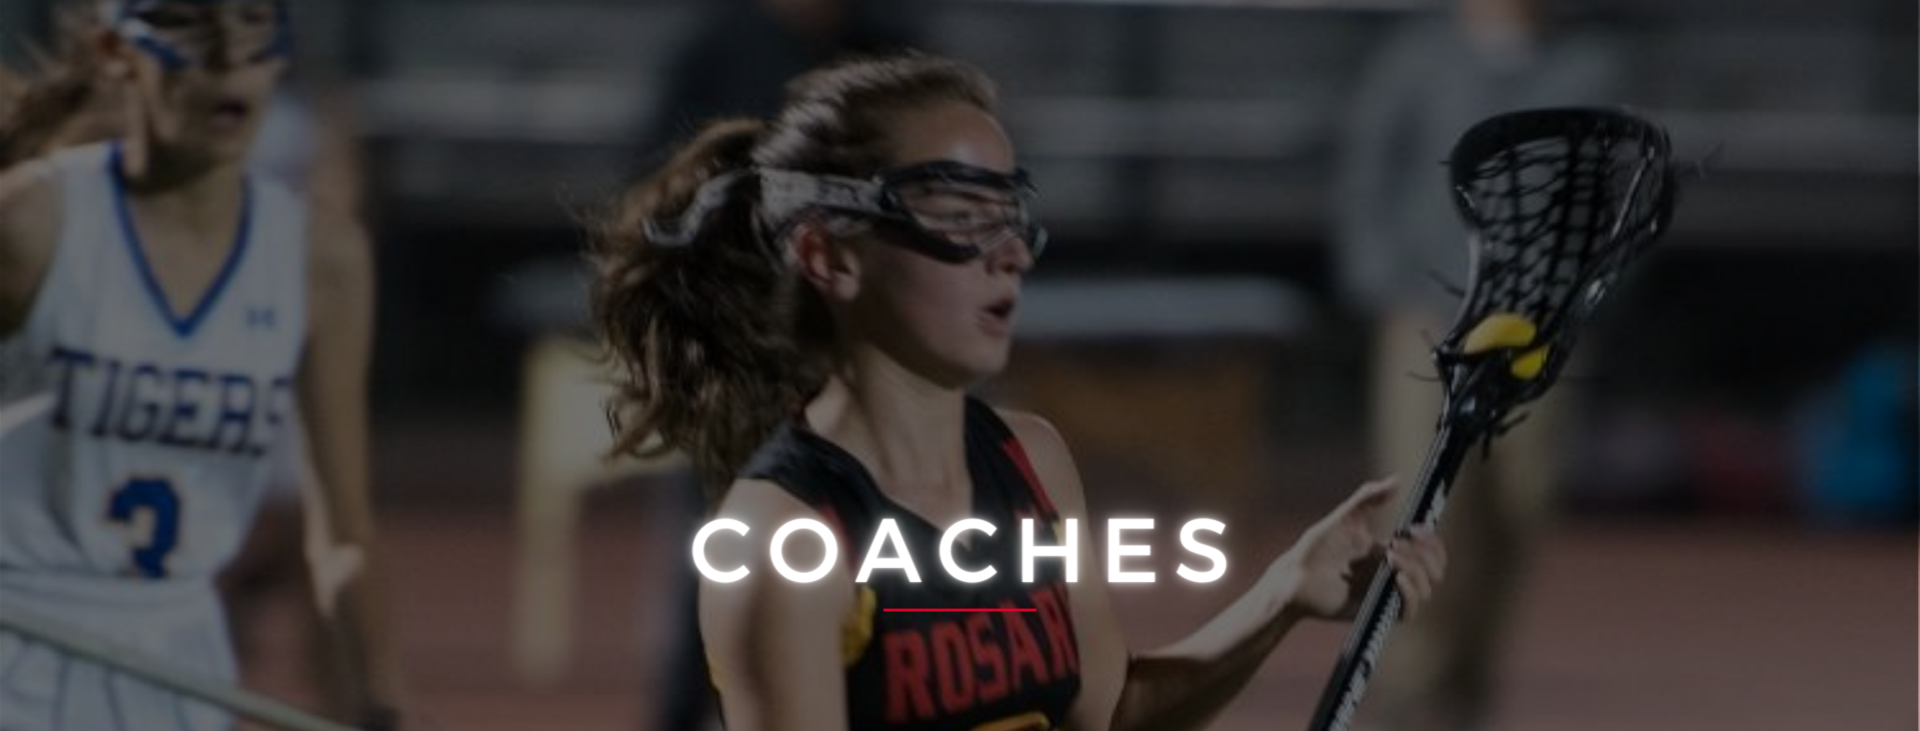 lax coaches